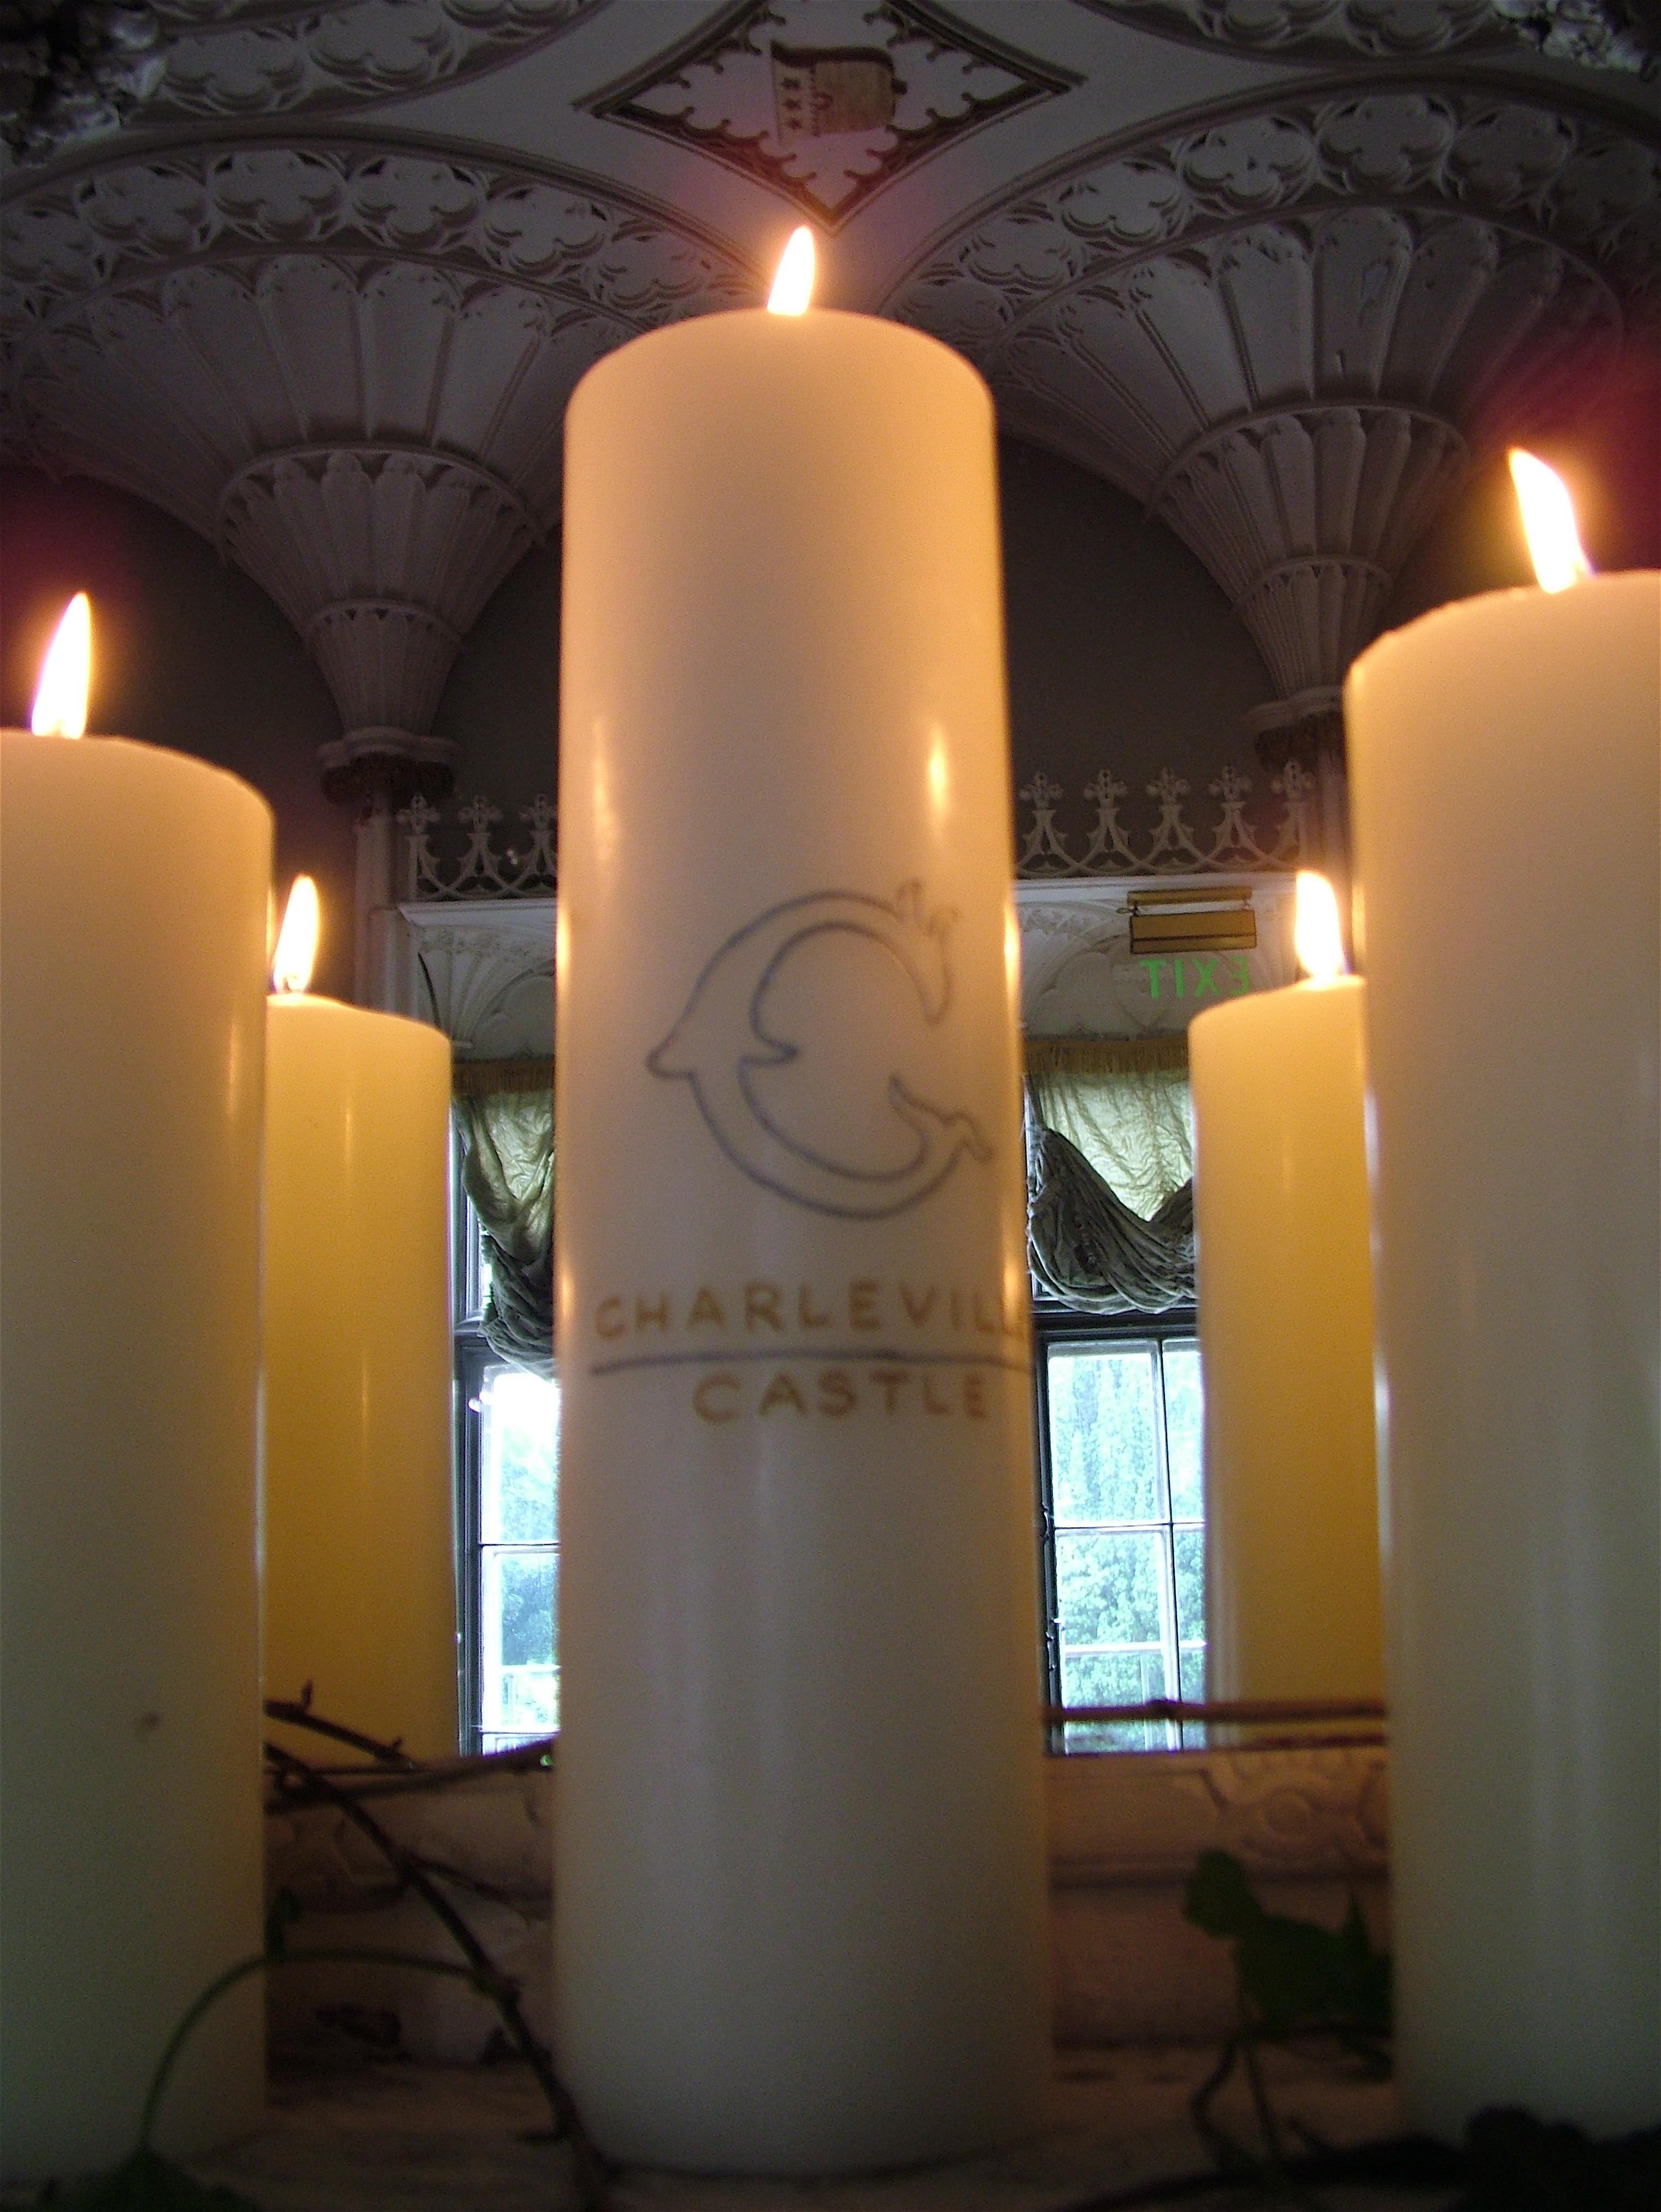 C Charleville candles